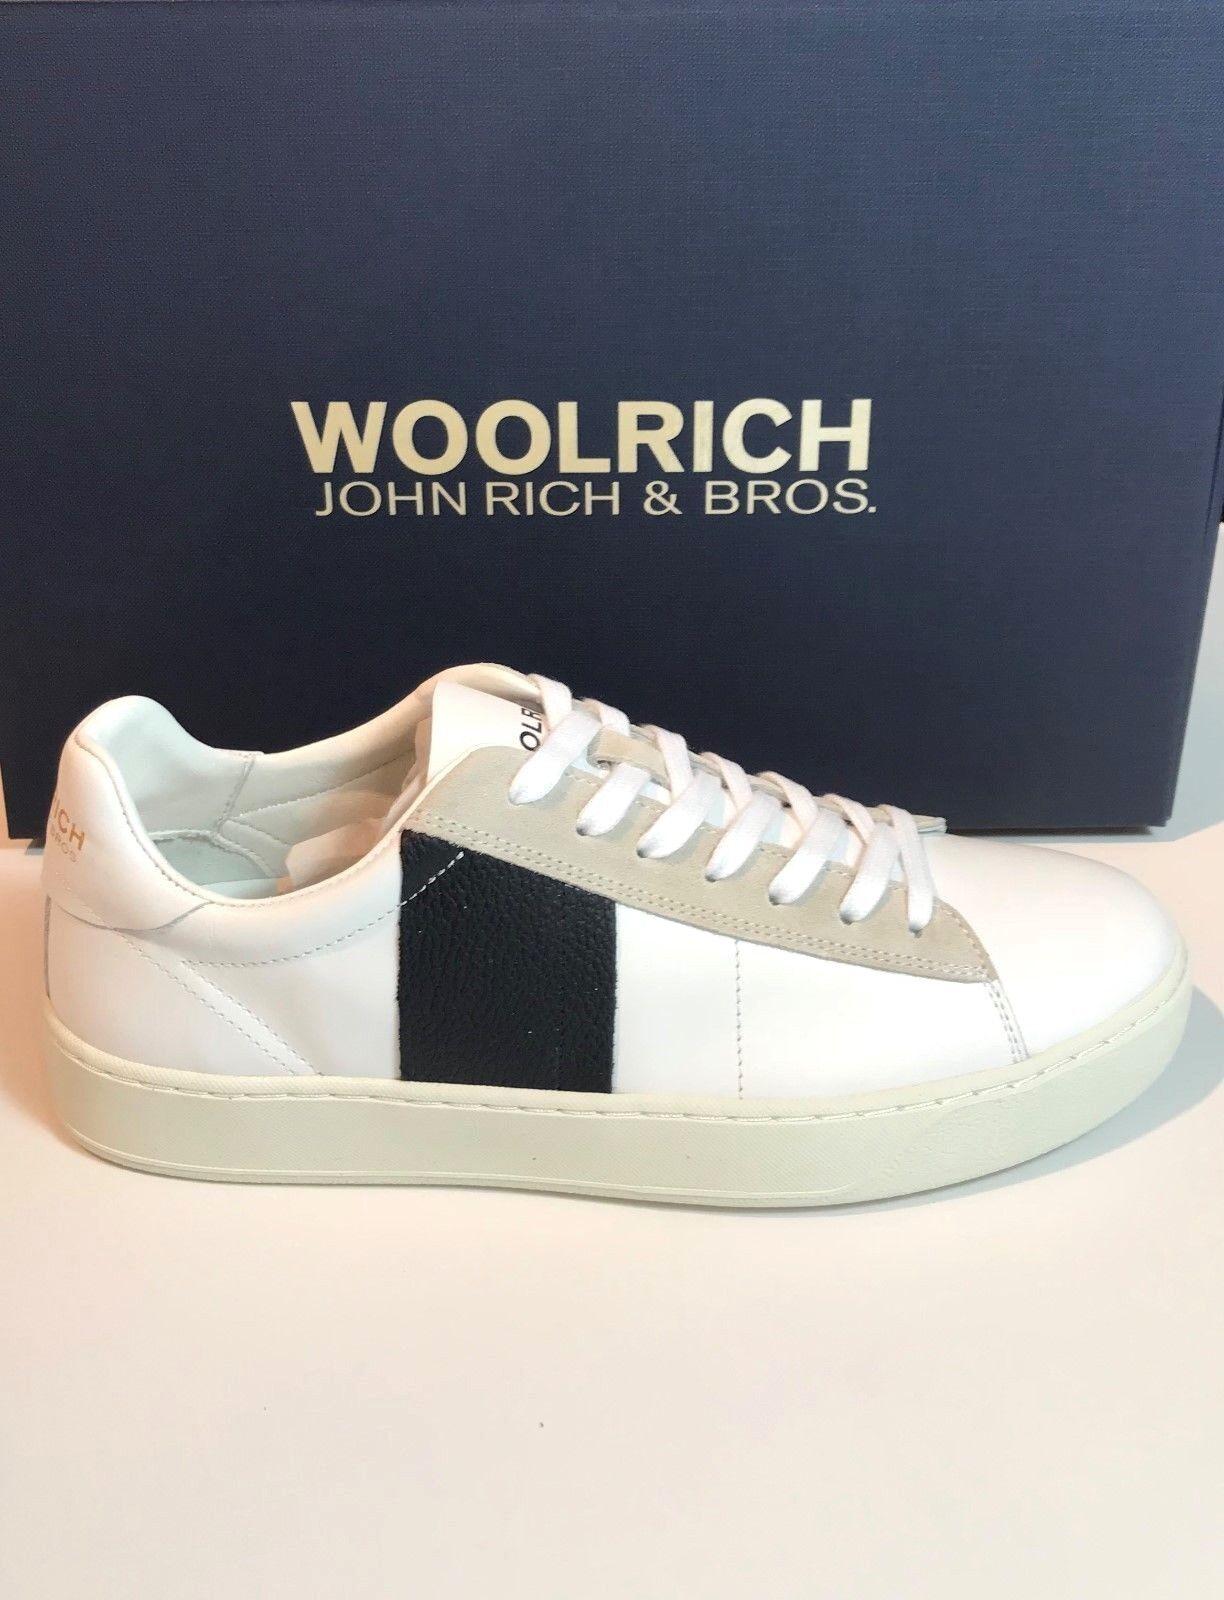 Woolrich SCARPE  Uomo ART. W2030412 calf leather white tanned blue vibram  2018